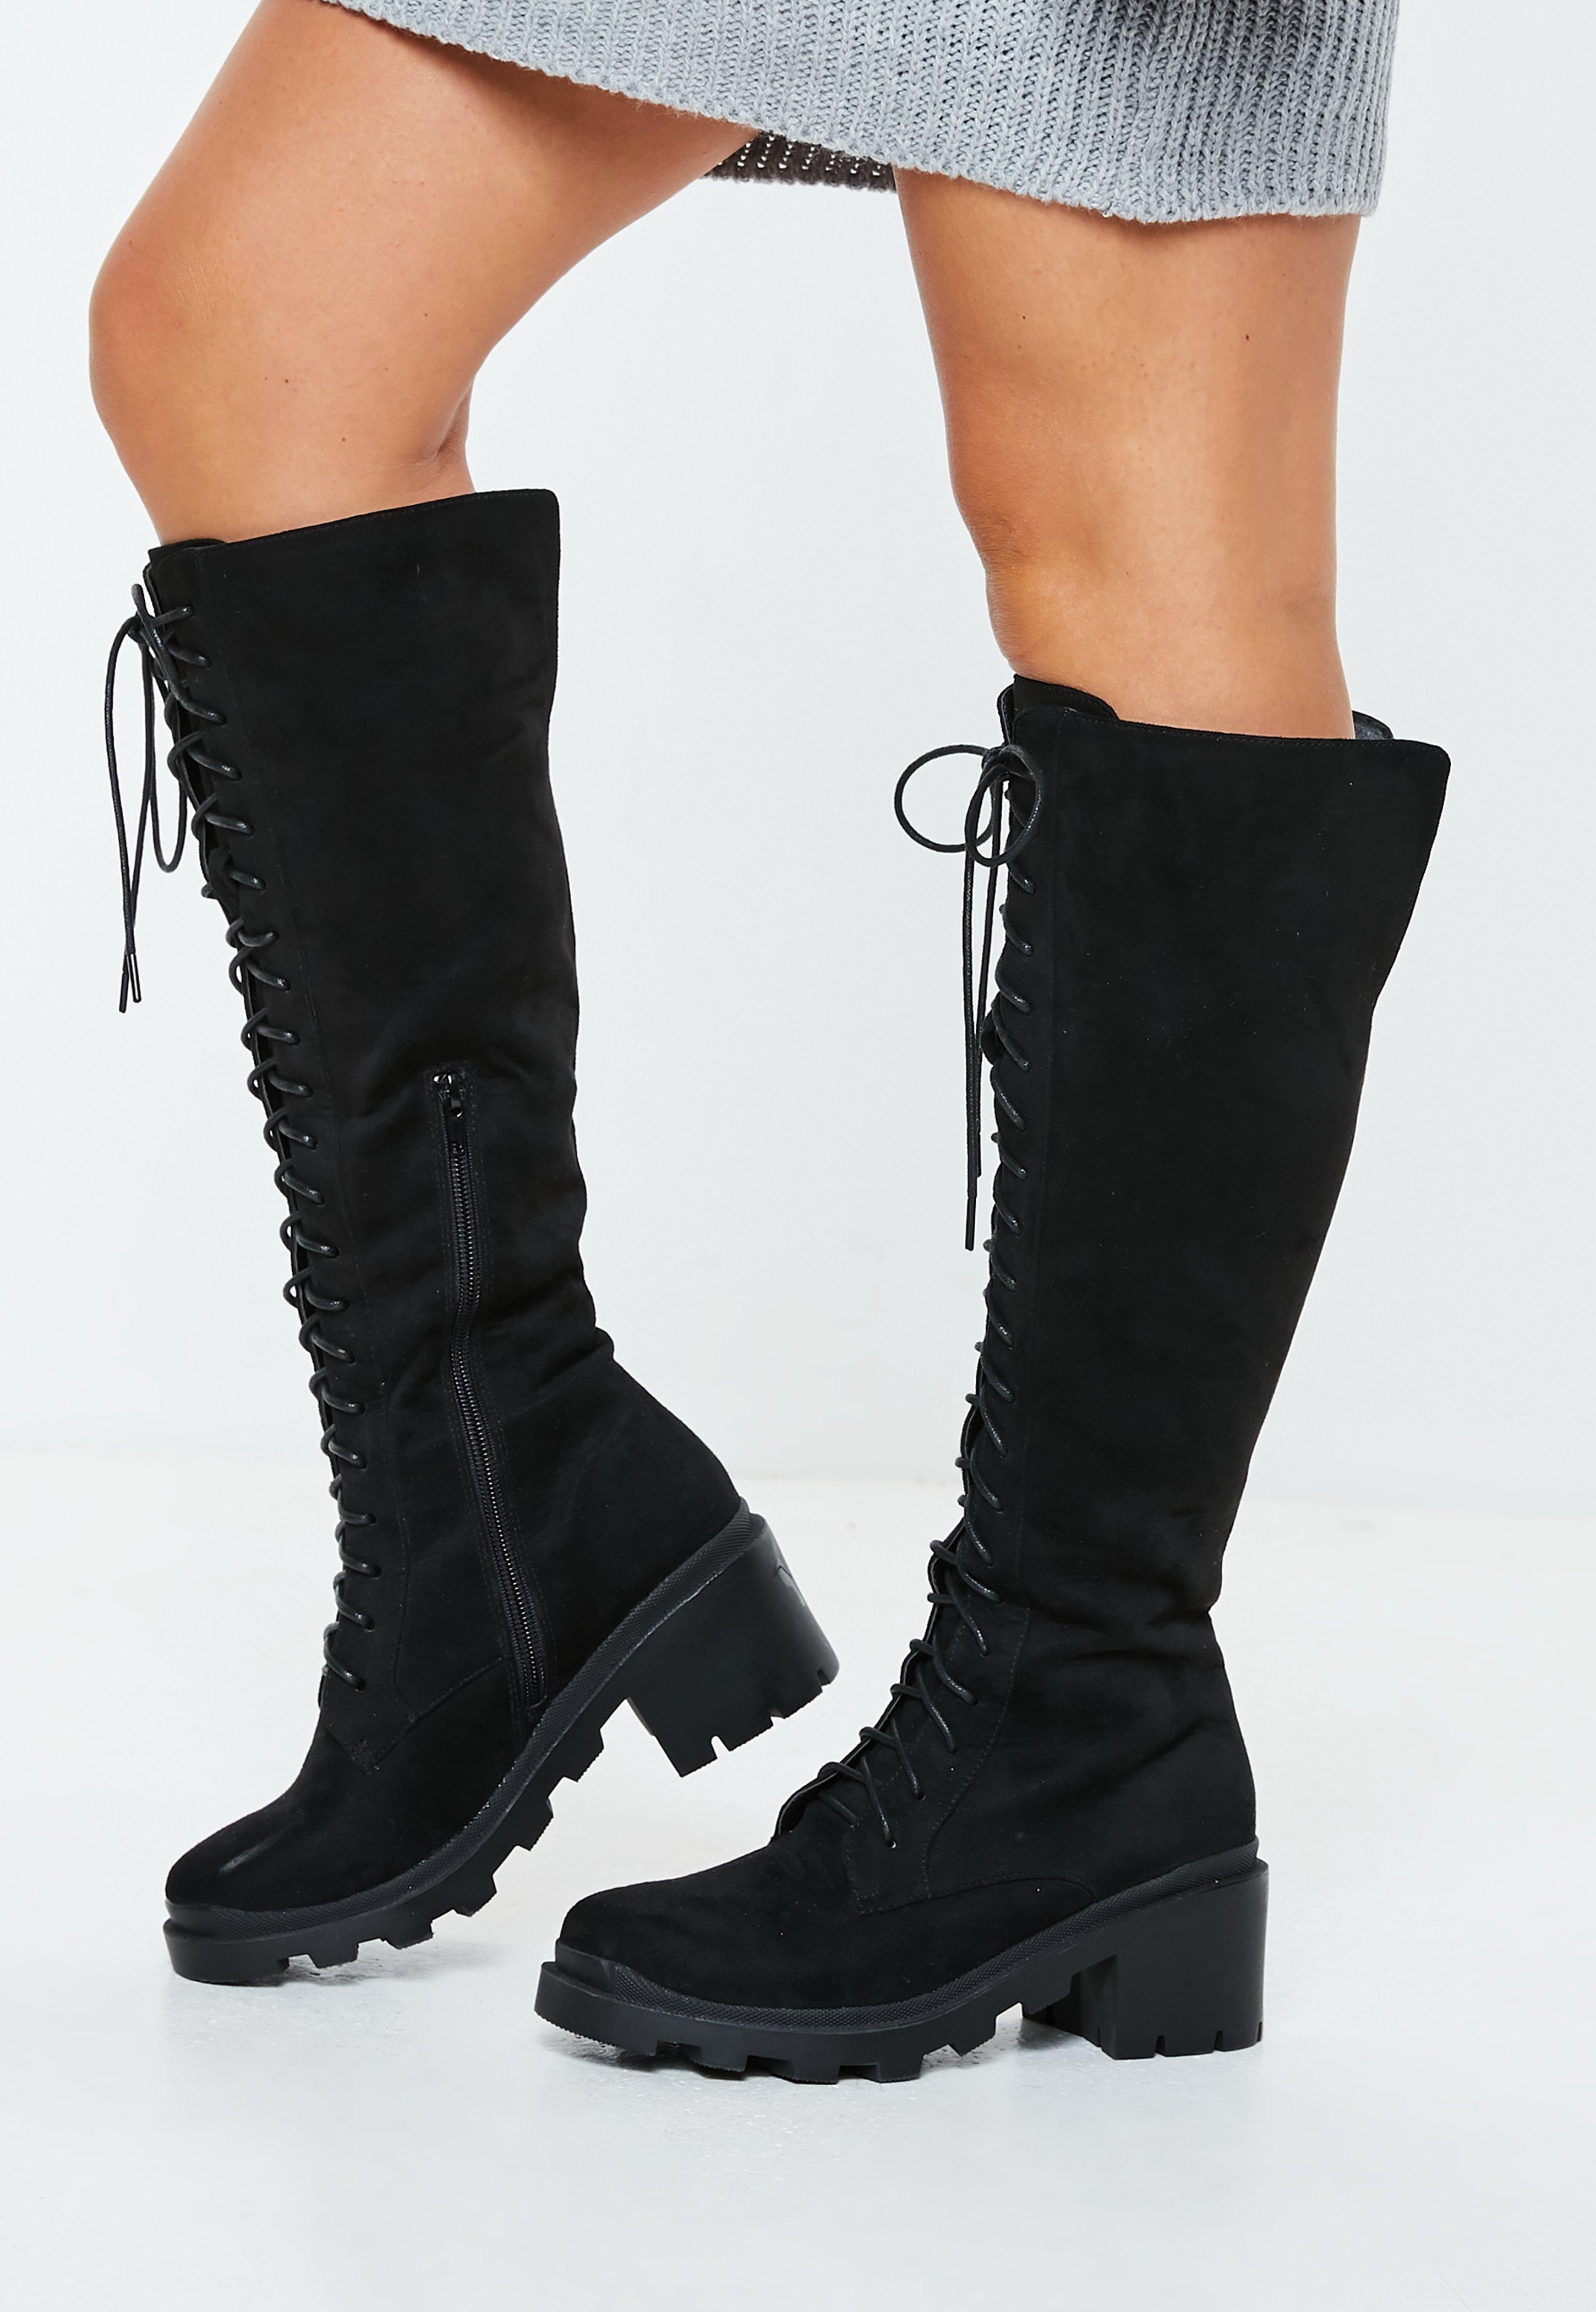 16aecb284e4 Knee High Boots